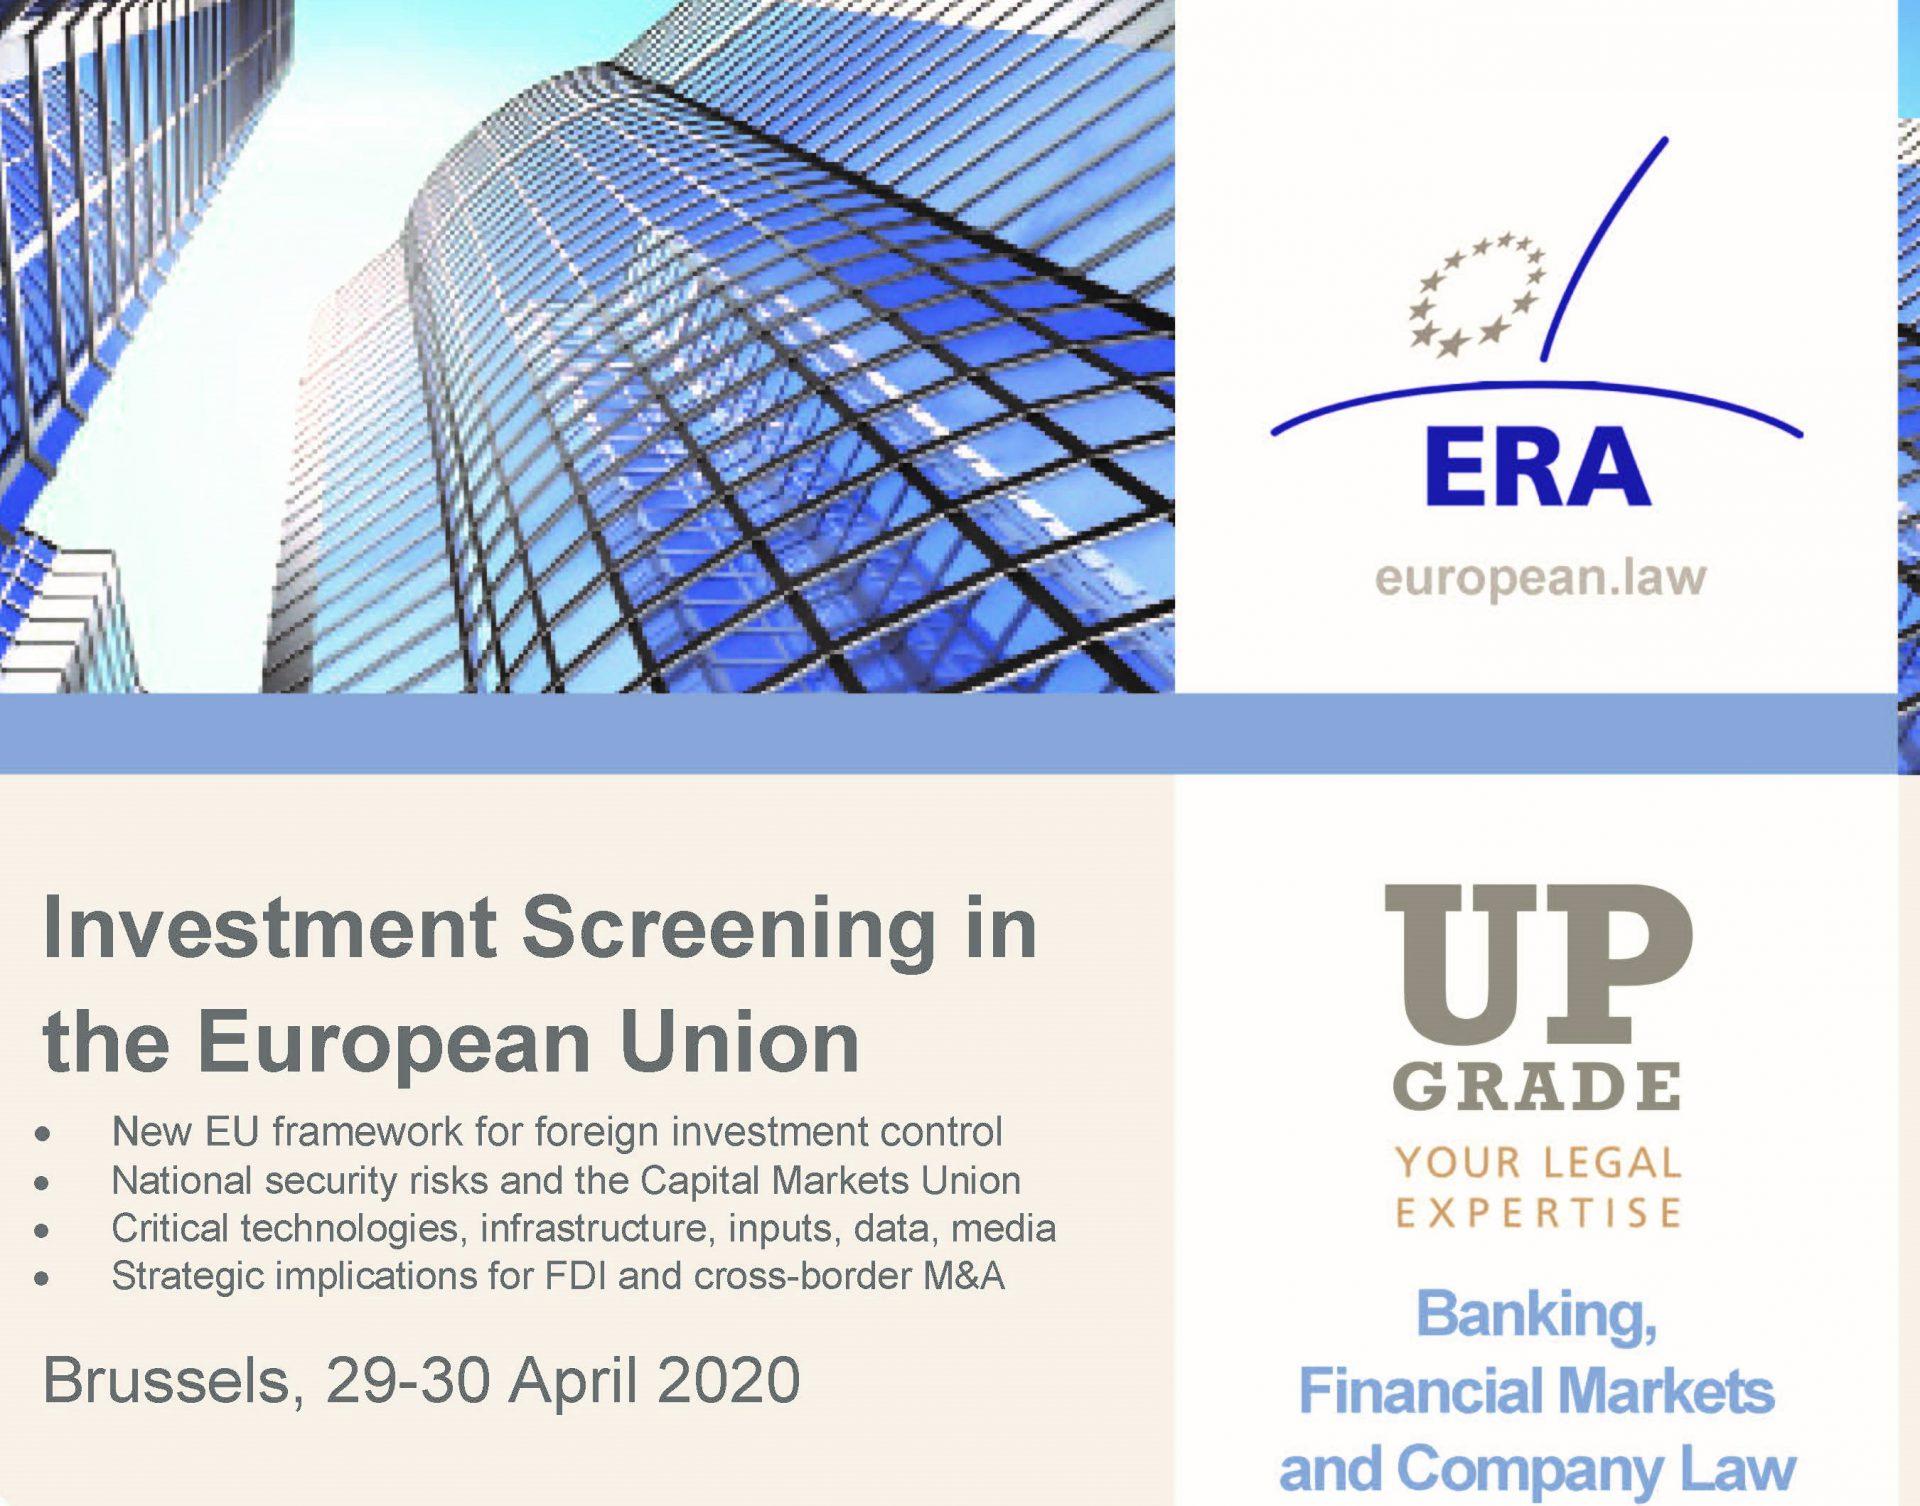 20200114_ERA_Programme_Investment_Screening_Seite_1-2